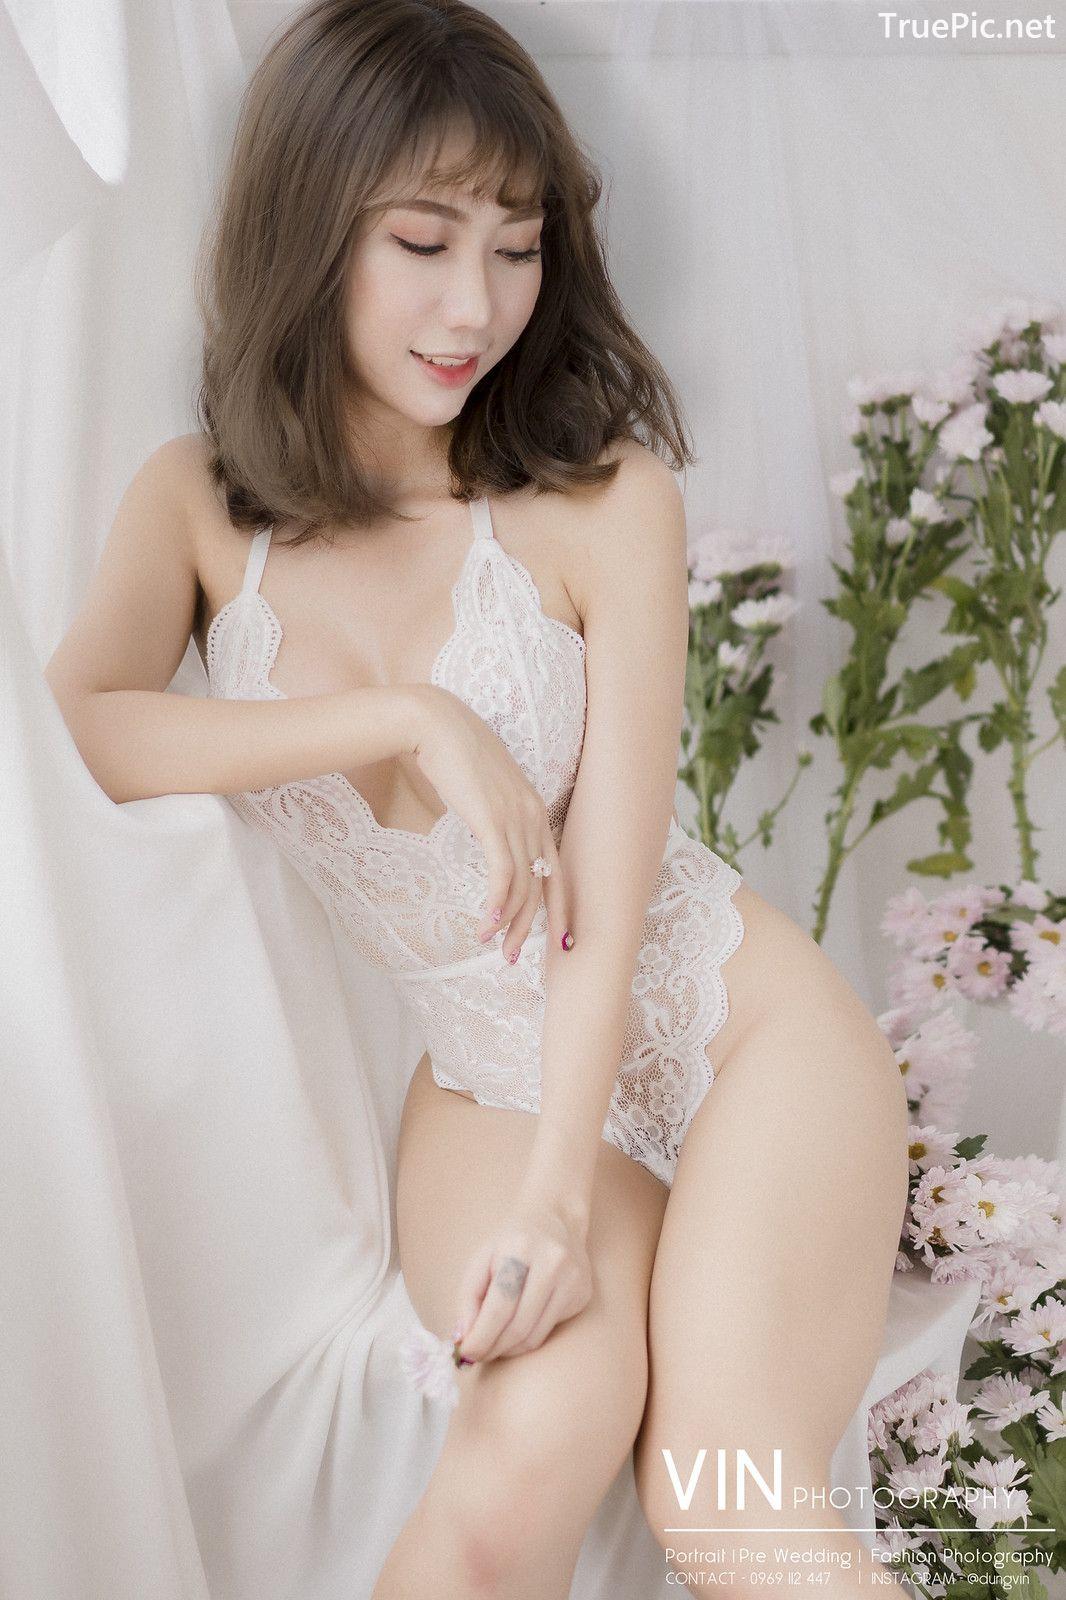 Image-Vietnamese-Hot-Model–Sexy-Beauty-of-Beautiful-Girls-Taken-by-VIN-Photo-3-TruePic.net- Picture-1